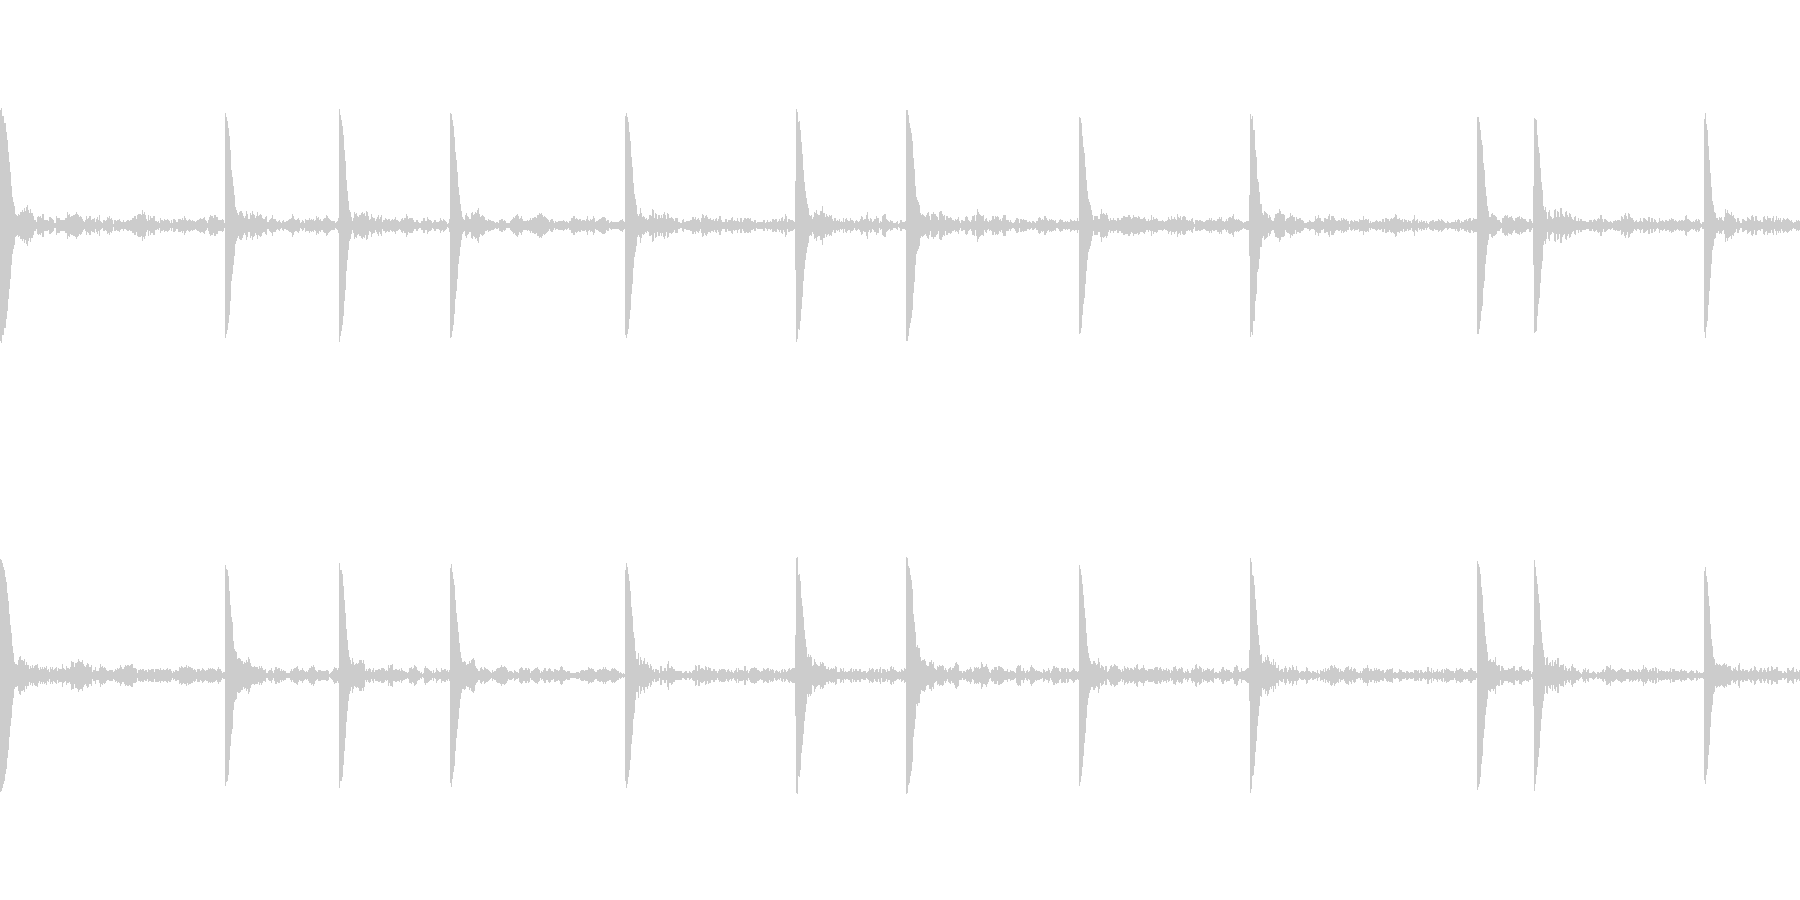 EDM PluckLoop3 音楽制作用の未再生の波形